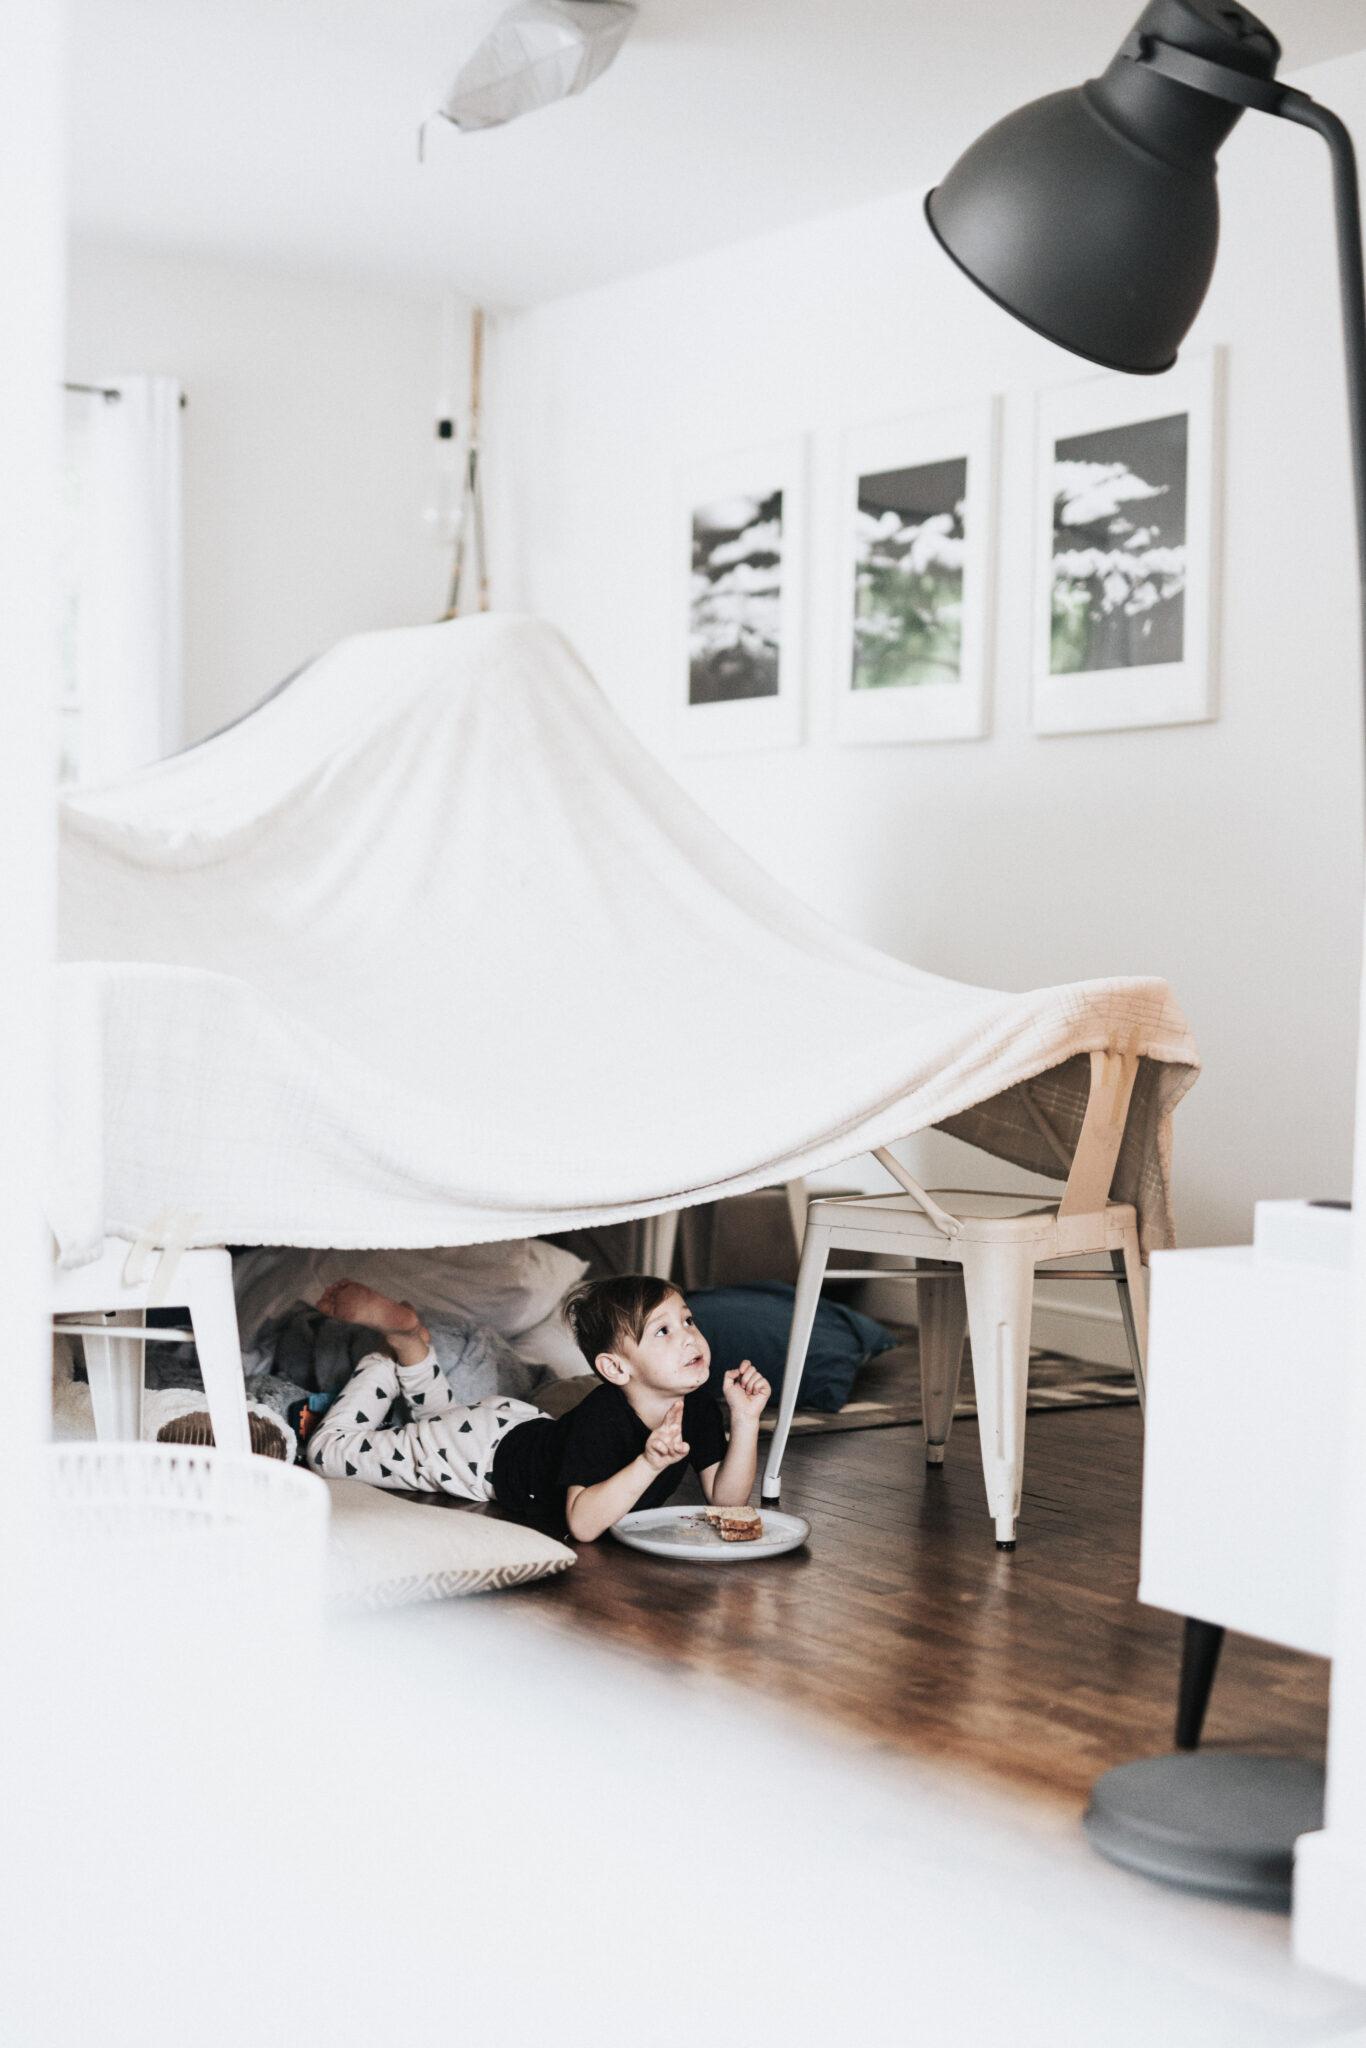 A little boy plays under a living room fort, eating a sandwich.